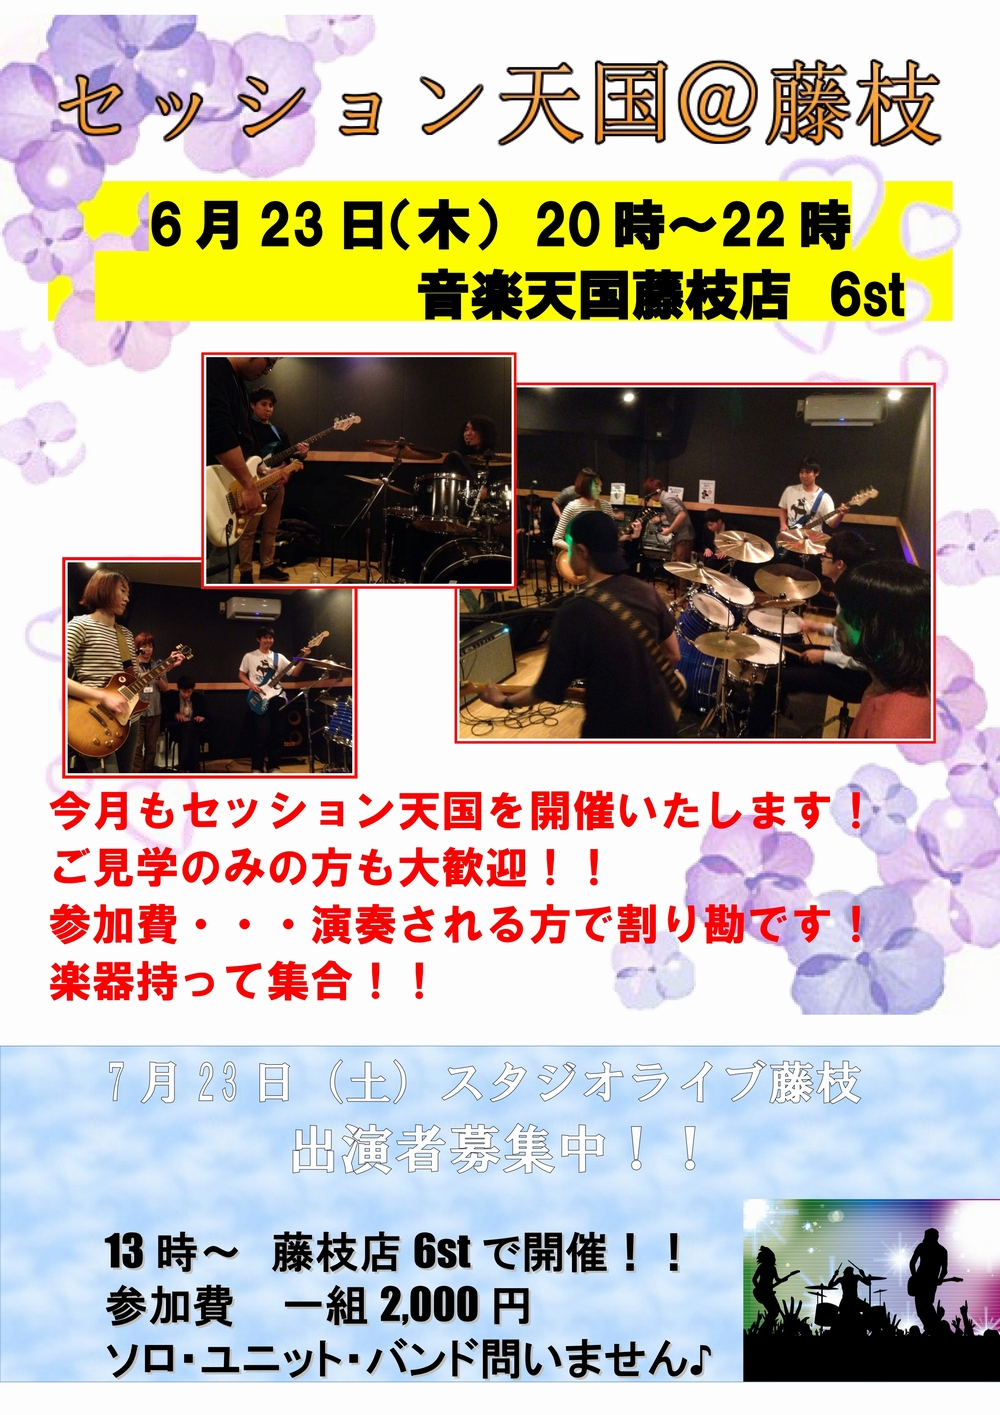 【セッション天国】音楽天国・藤枝店6月23日(木)開催